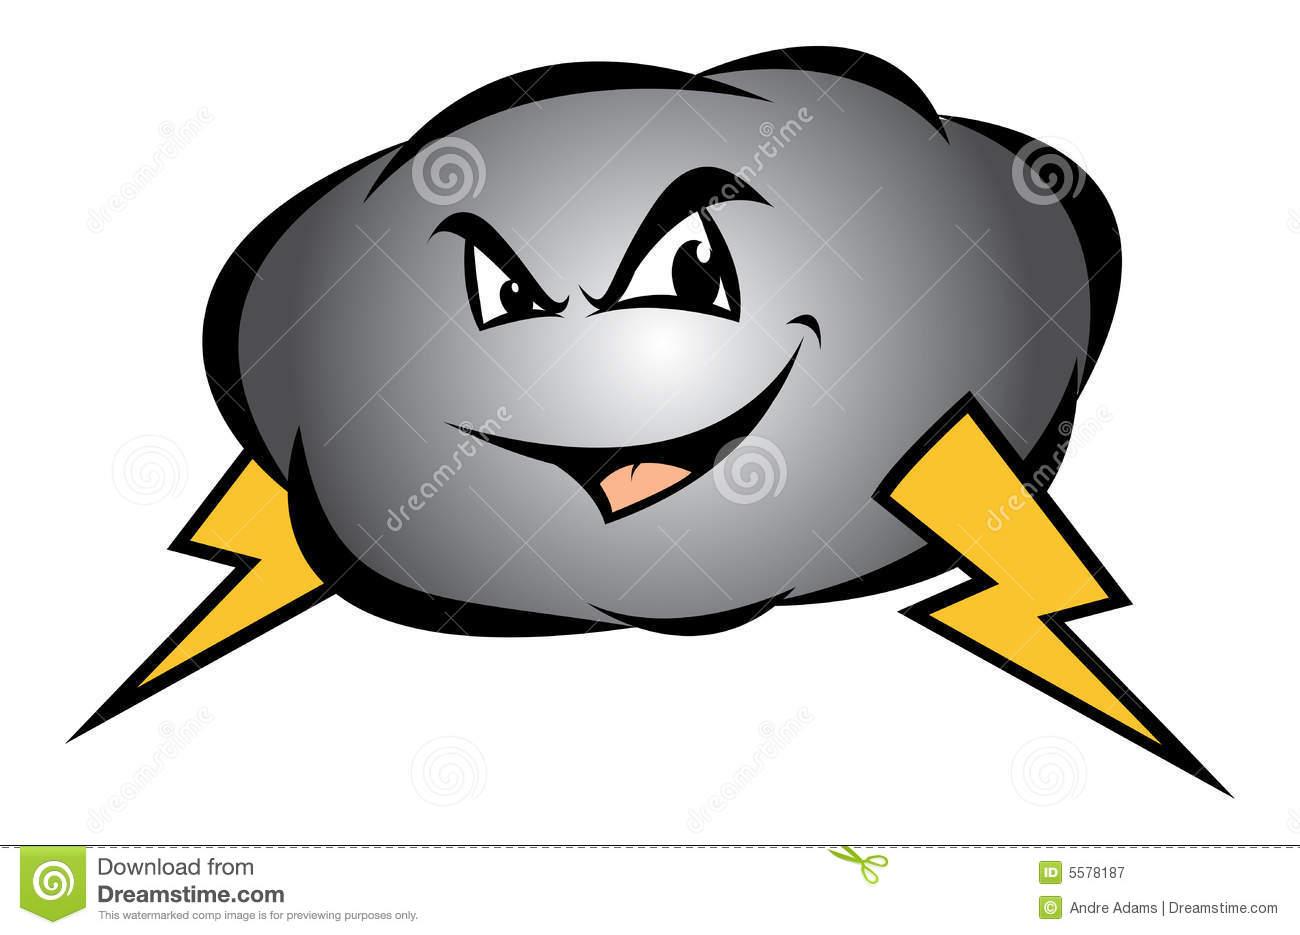 1300x935 Stormy Cloud Clipart, Explore Pictures